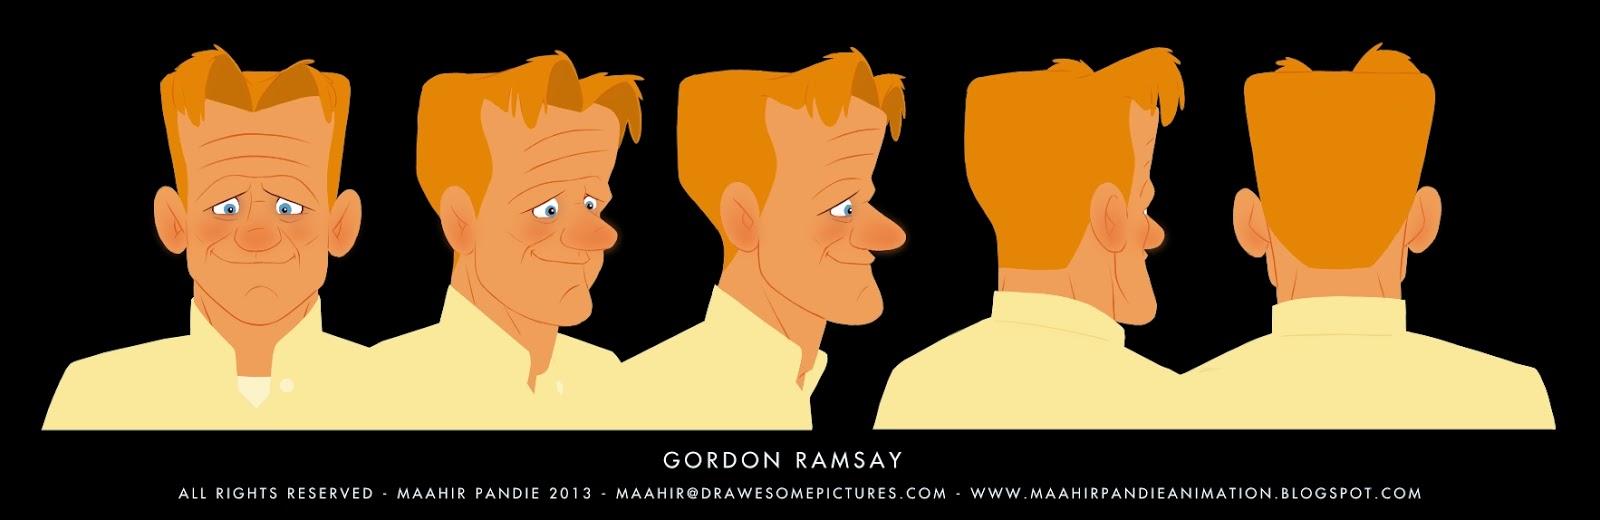 Ramsay_final_00.jpg